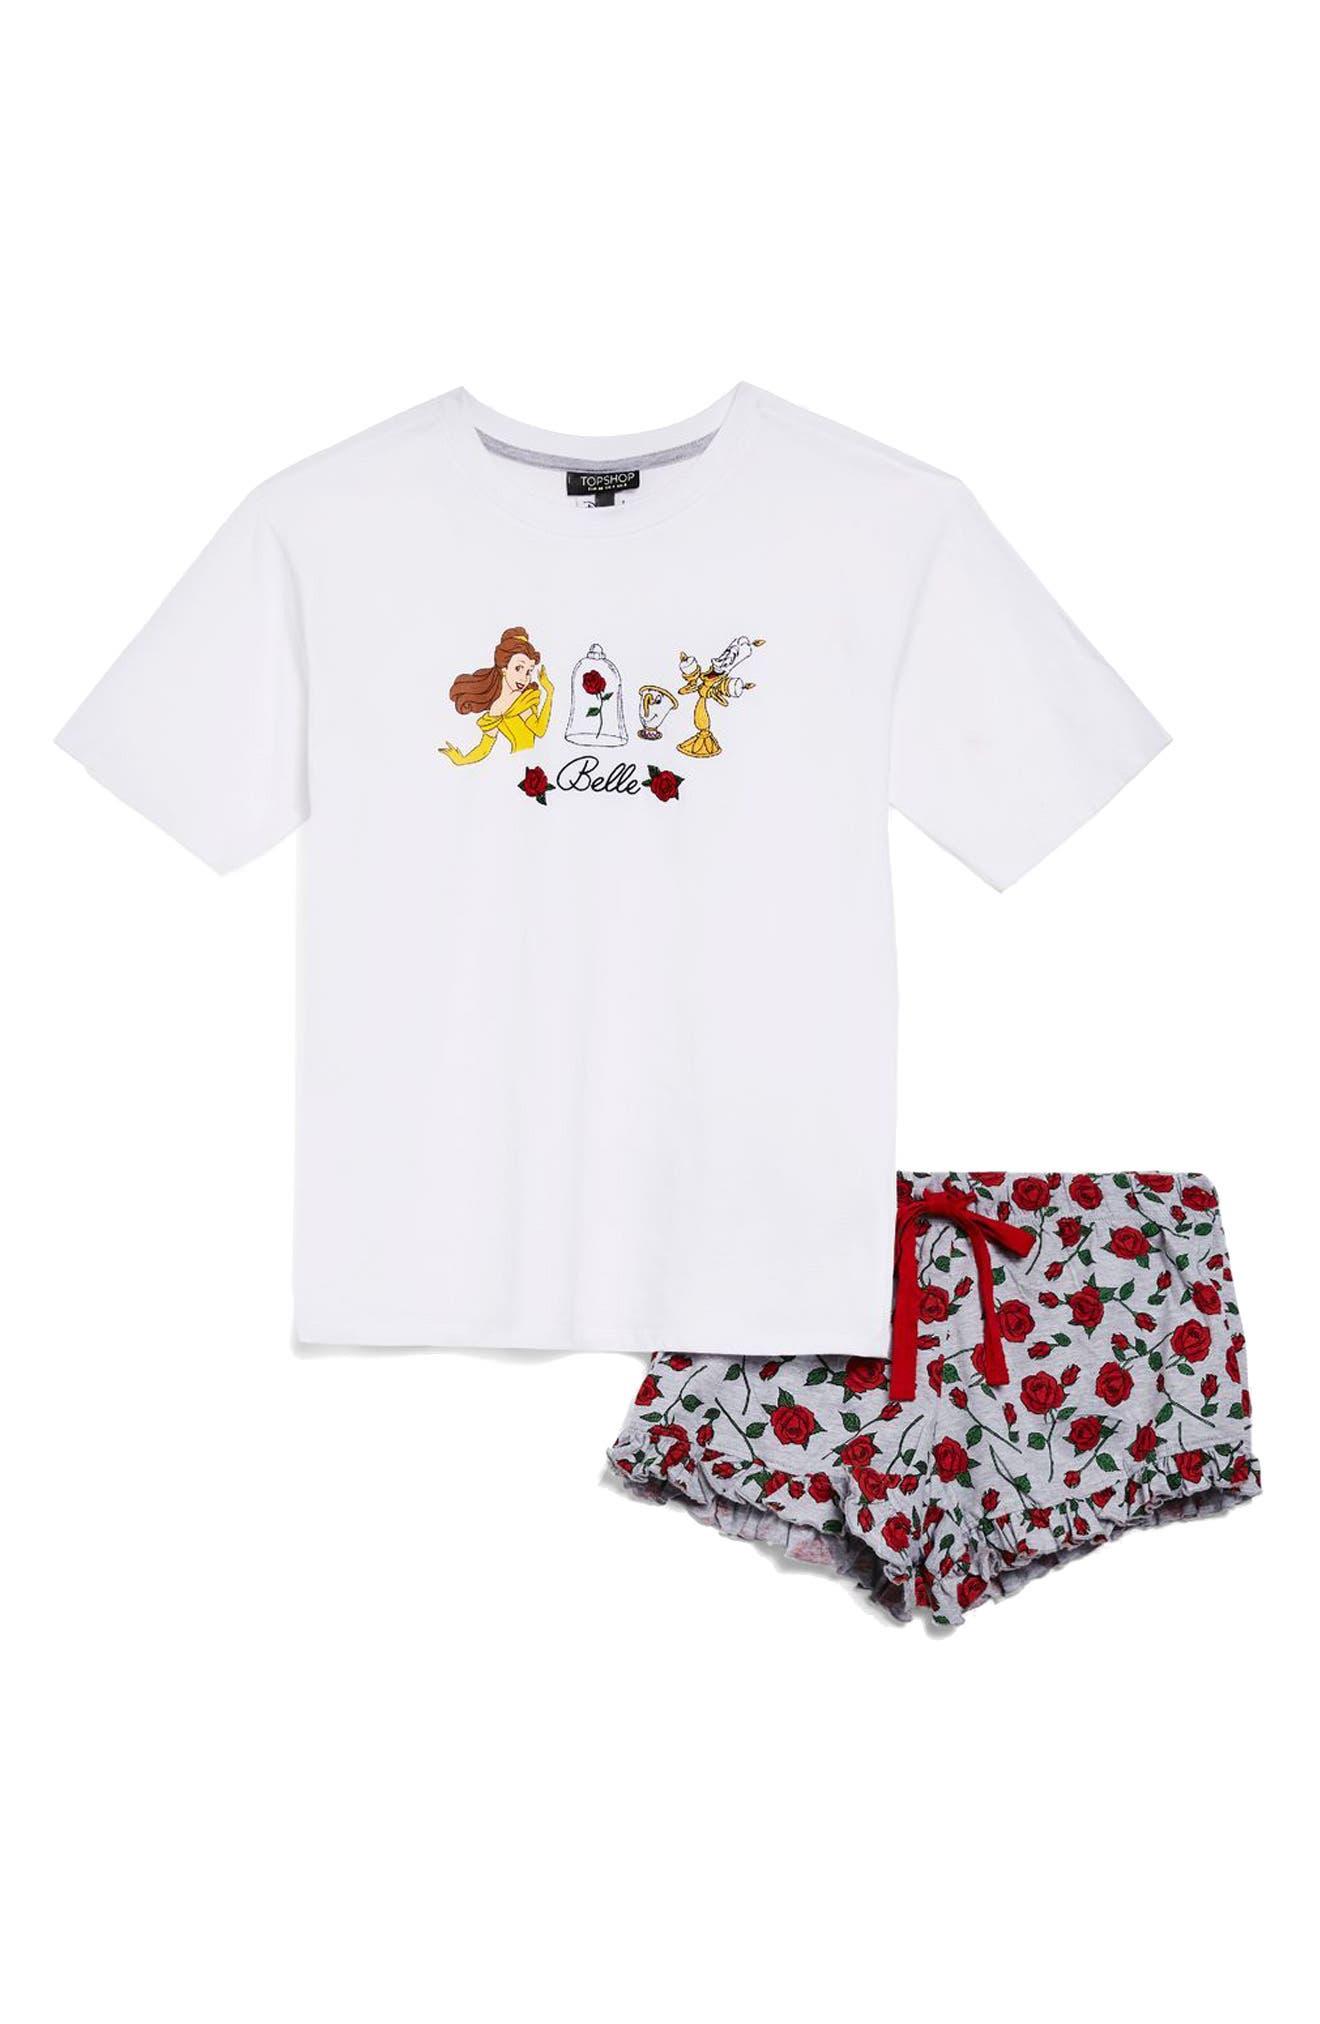 TOPSHOP,                             Disney<sup>®</sup> Belle Rose Short Pajamas,                             Alternate thumbnail 3, color,                             100